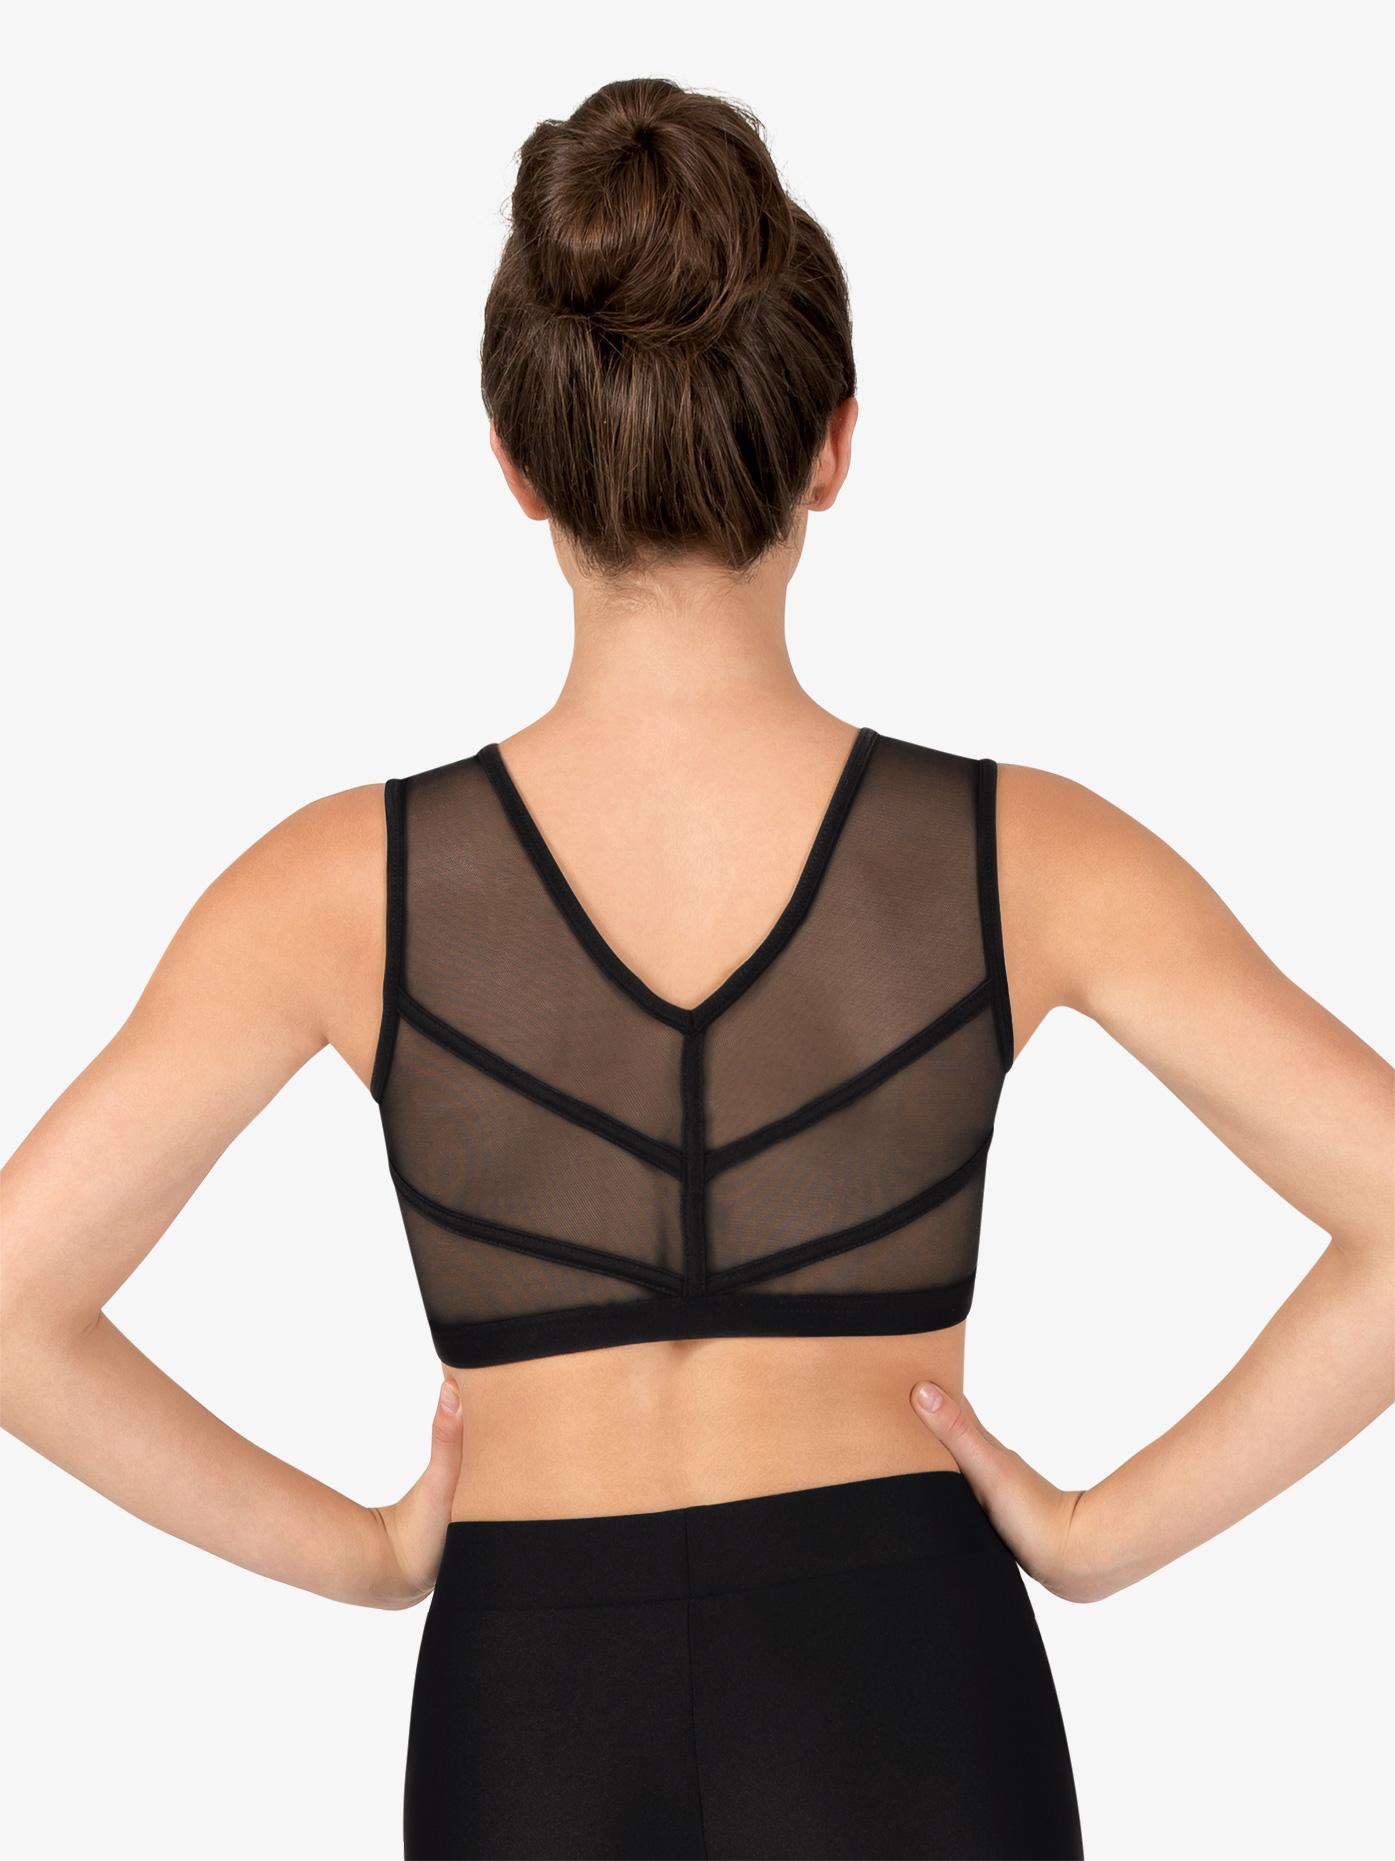 Natalie Couture Womens Mesh Binding V-Back Dance Tank Bra Top NC8912